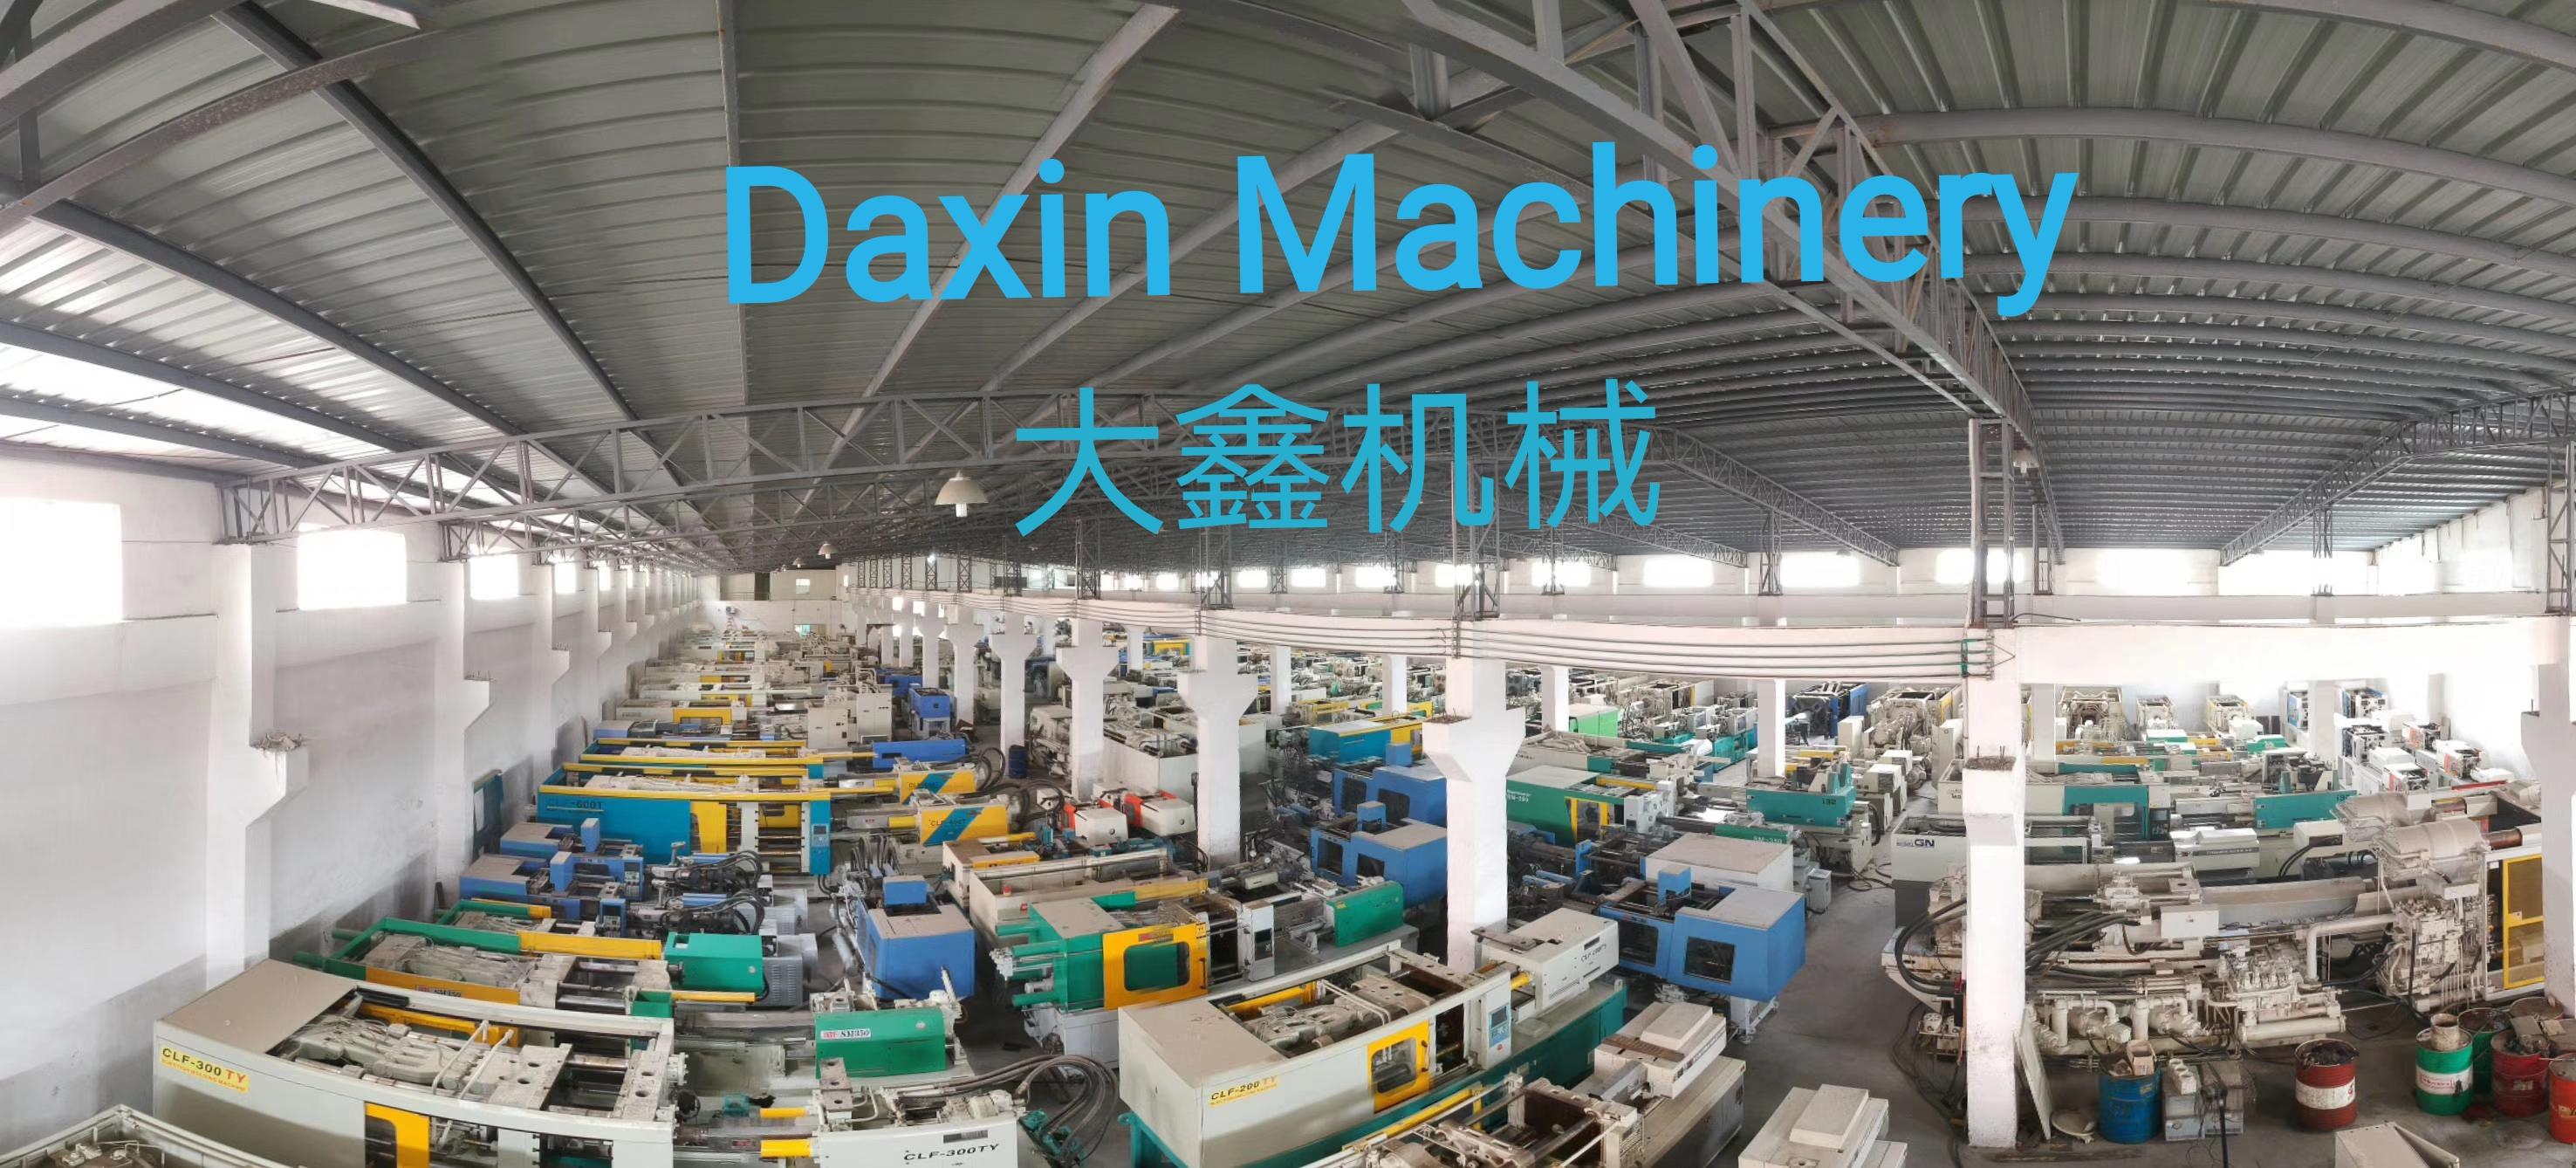 دوستسبشی 850t (850MMV) استعمال شدہ انجکشن مولڈنگ مشین